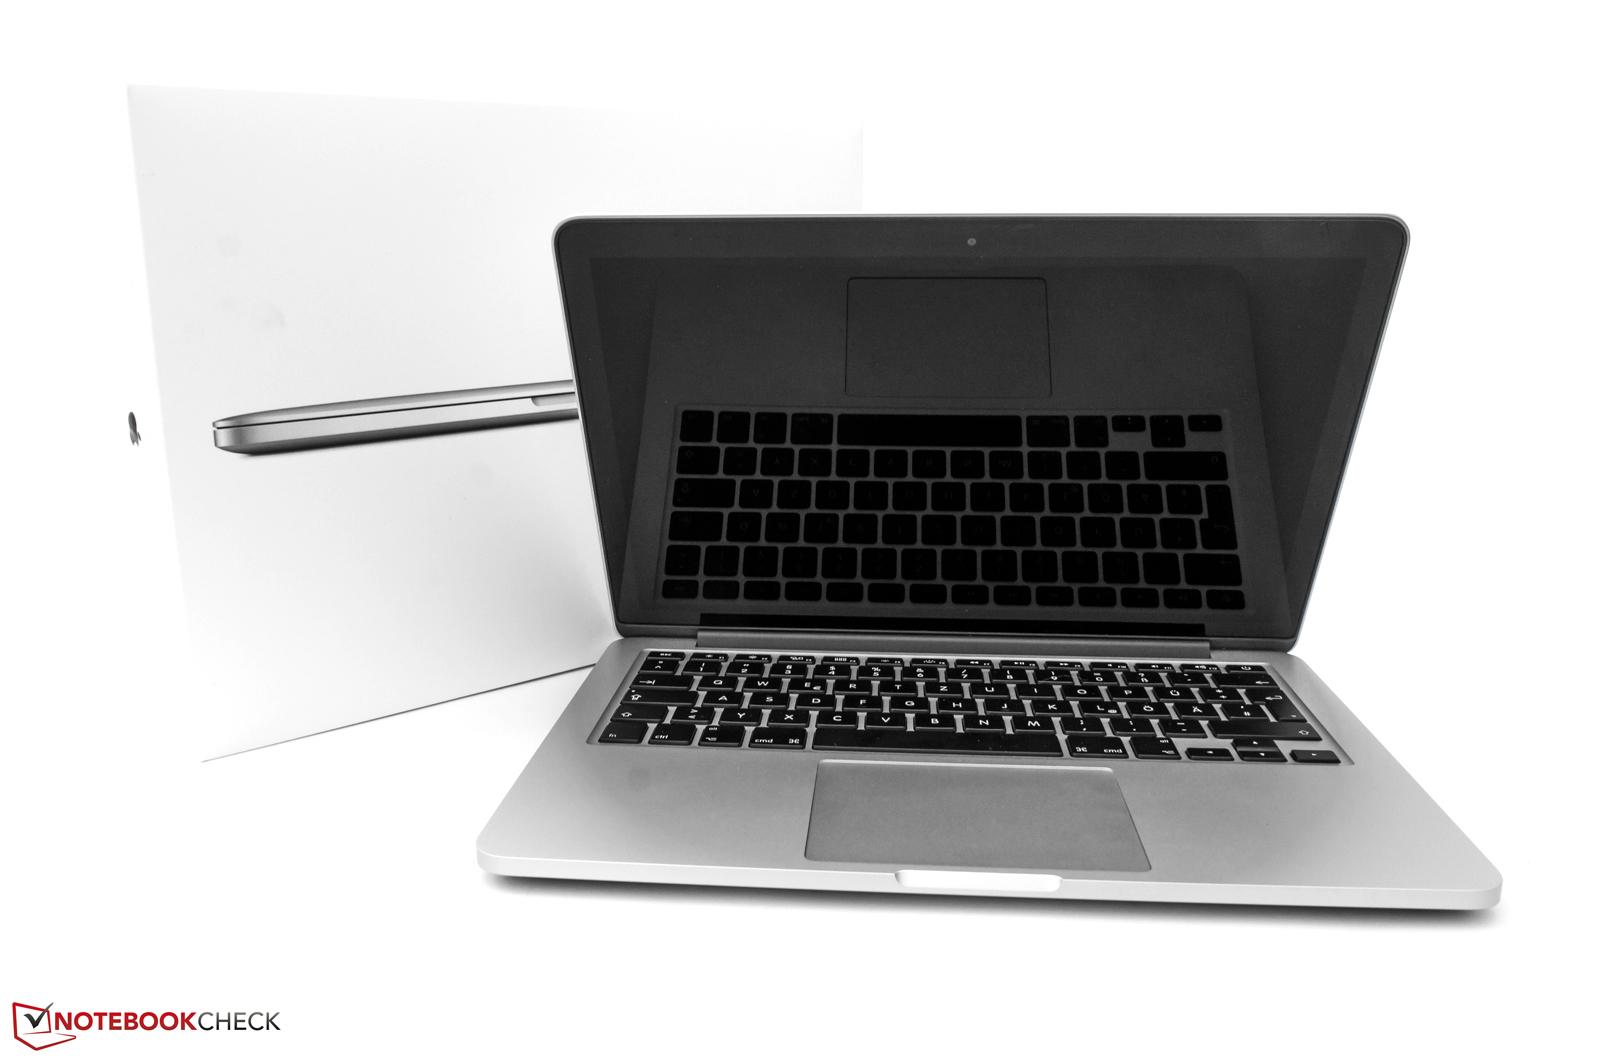 macbook pro 13 2012 review